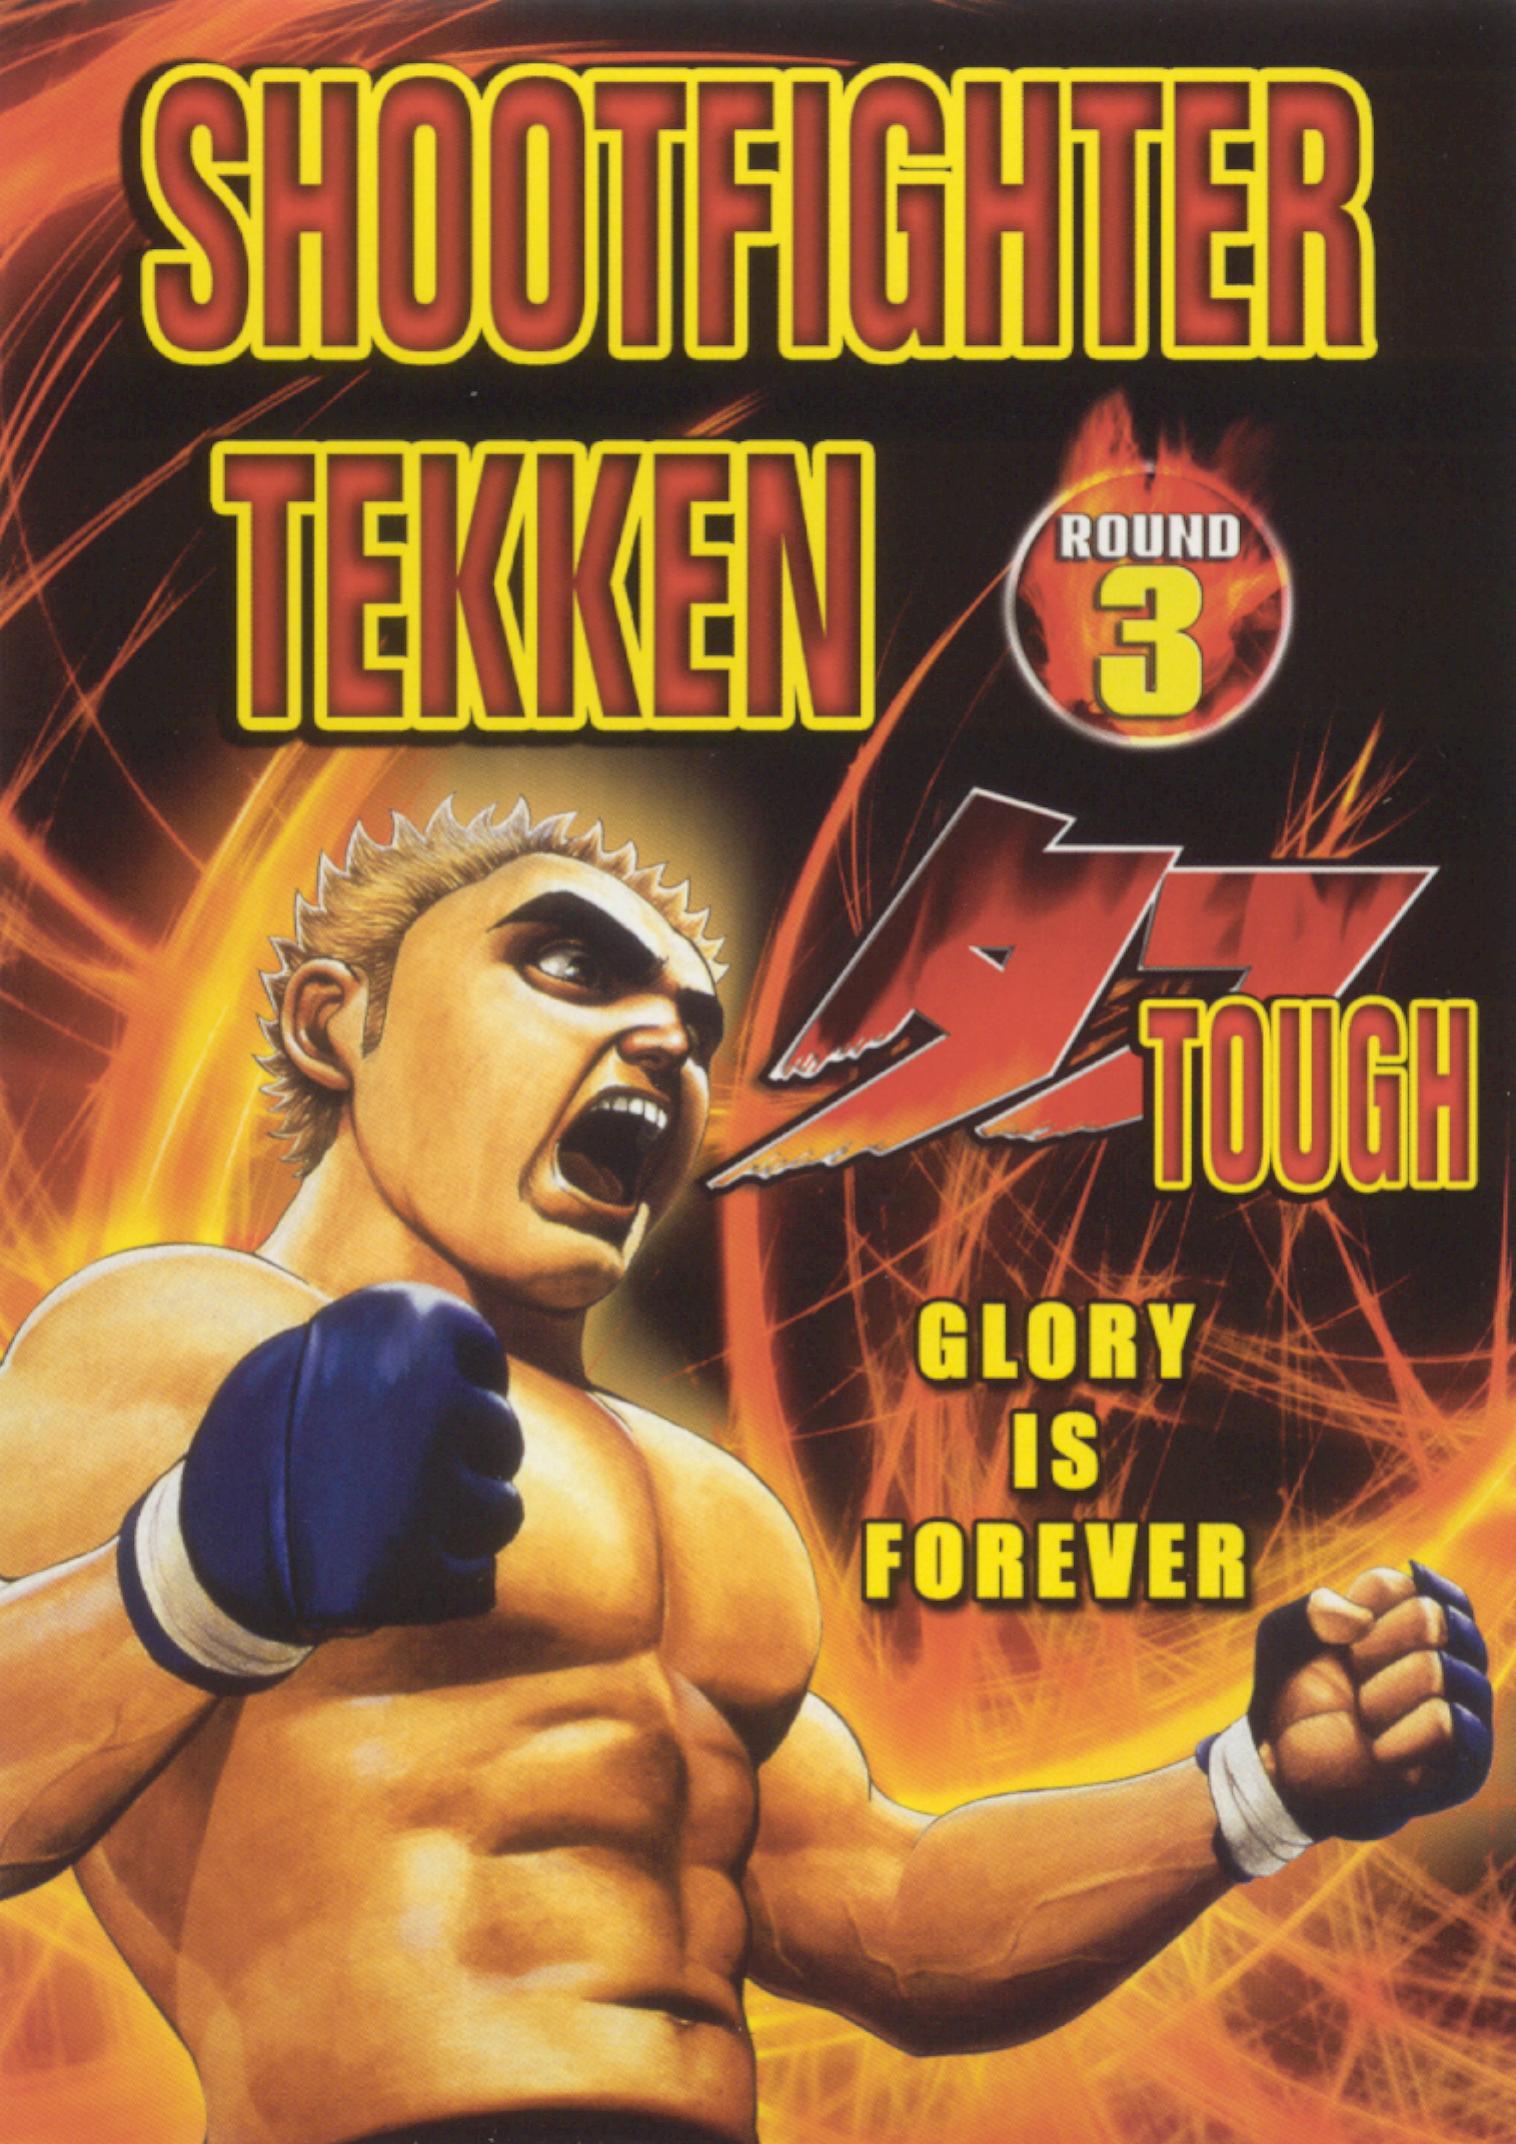 Shootfighter Tekken: Round 3